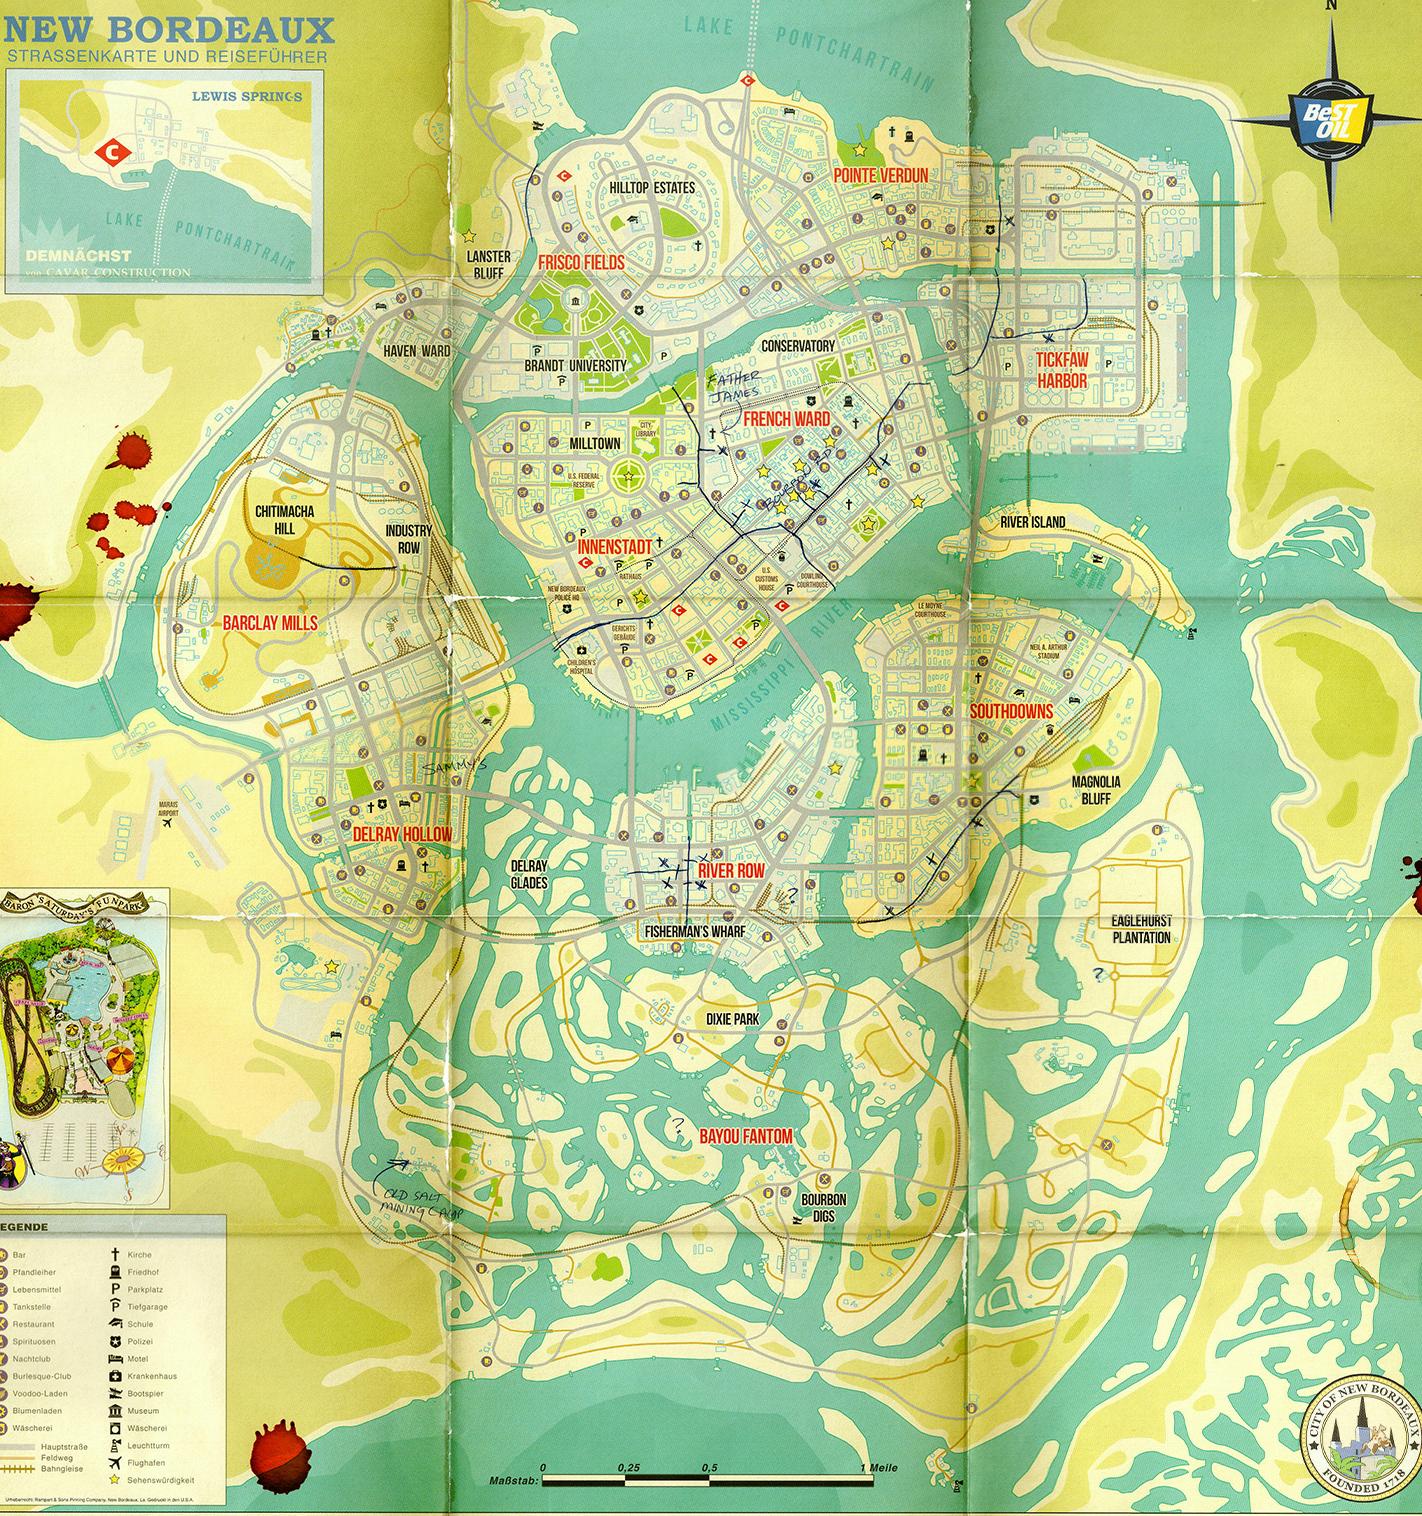 Mafia Karte